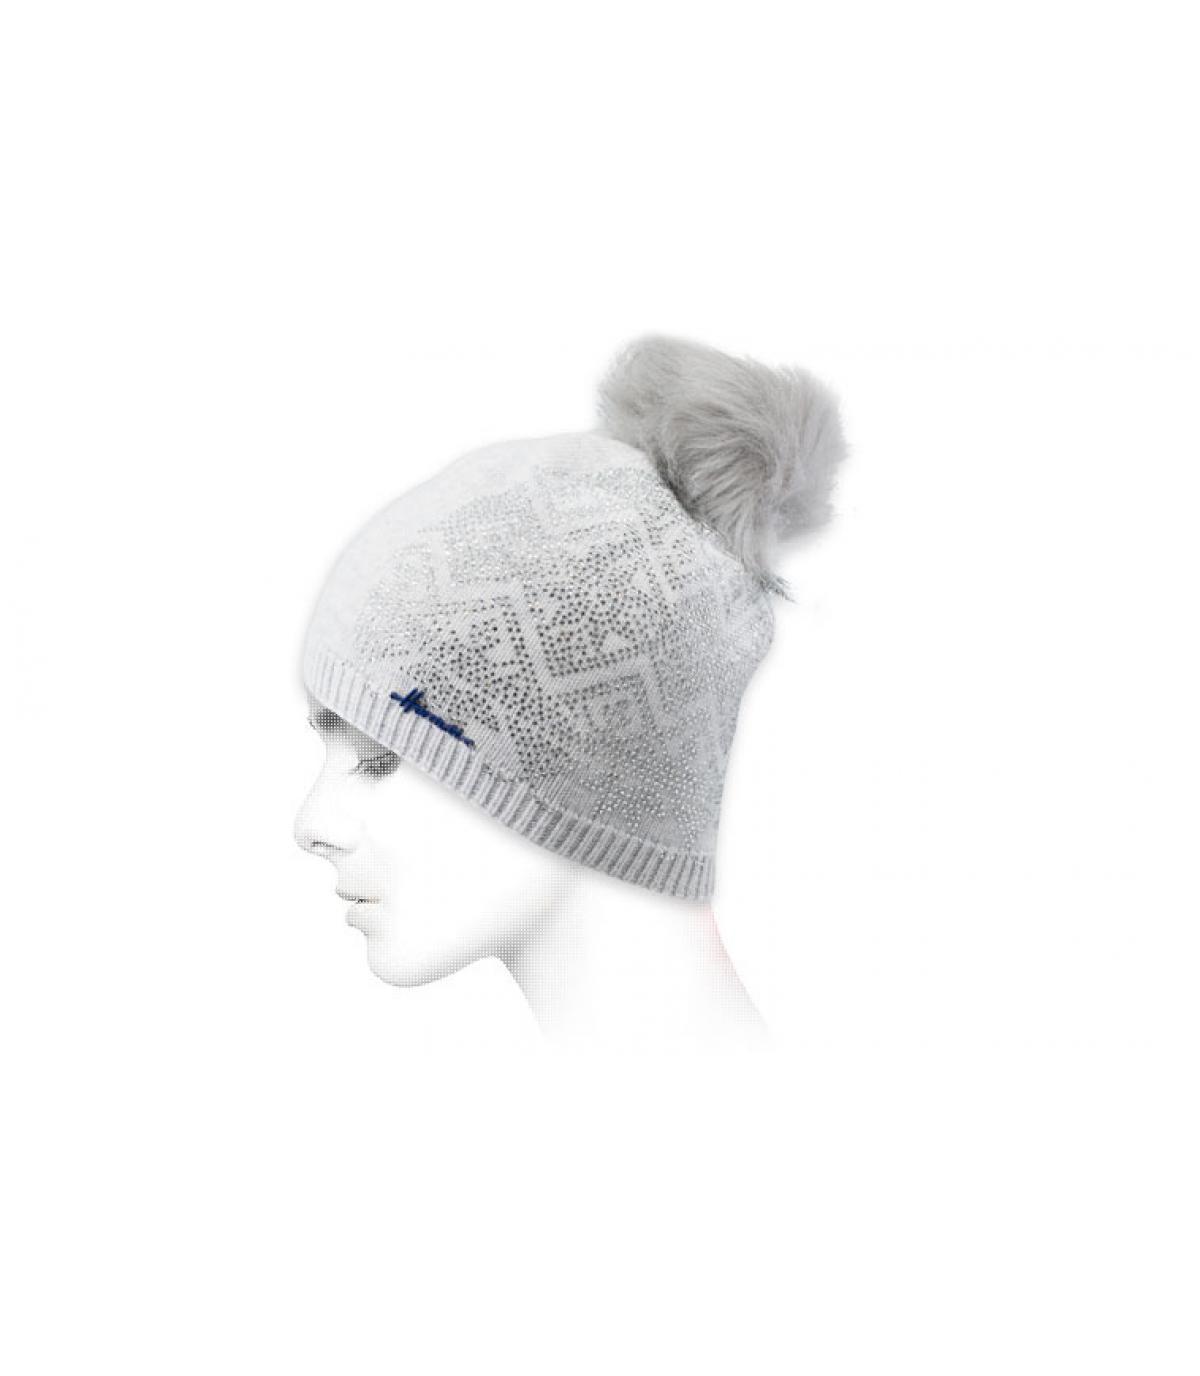 Mütze himmelblau Strass